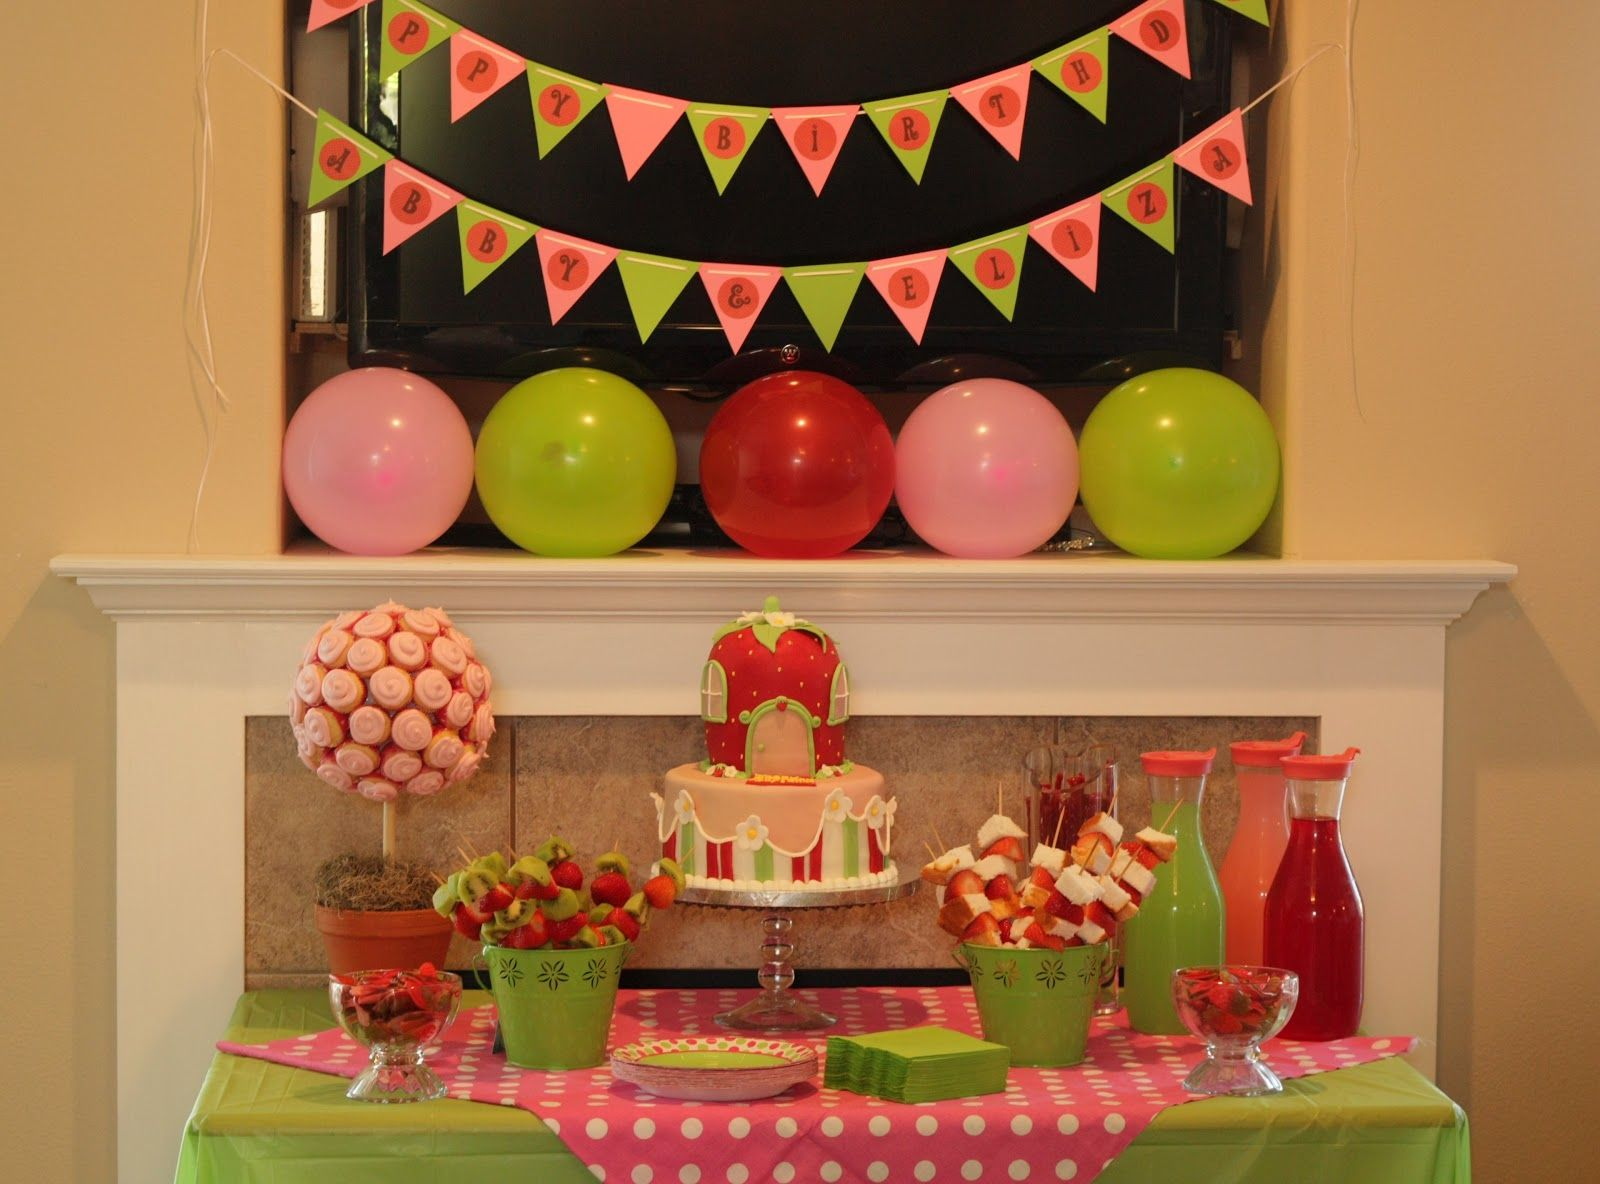 124 best Strawberry shortcake party images on Pinterest   Birthday ...